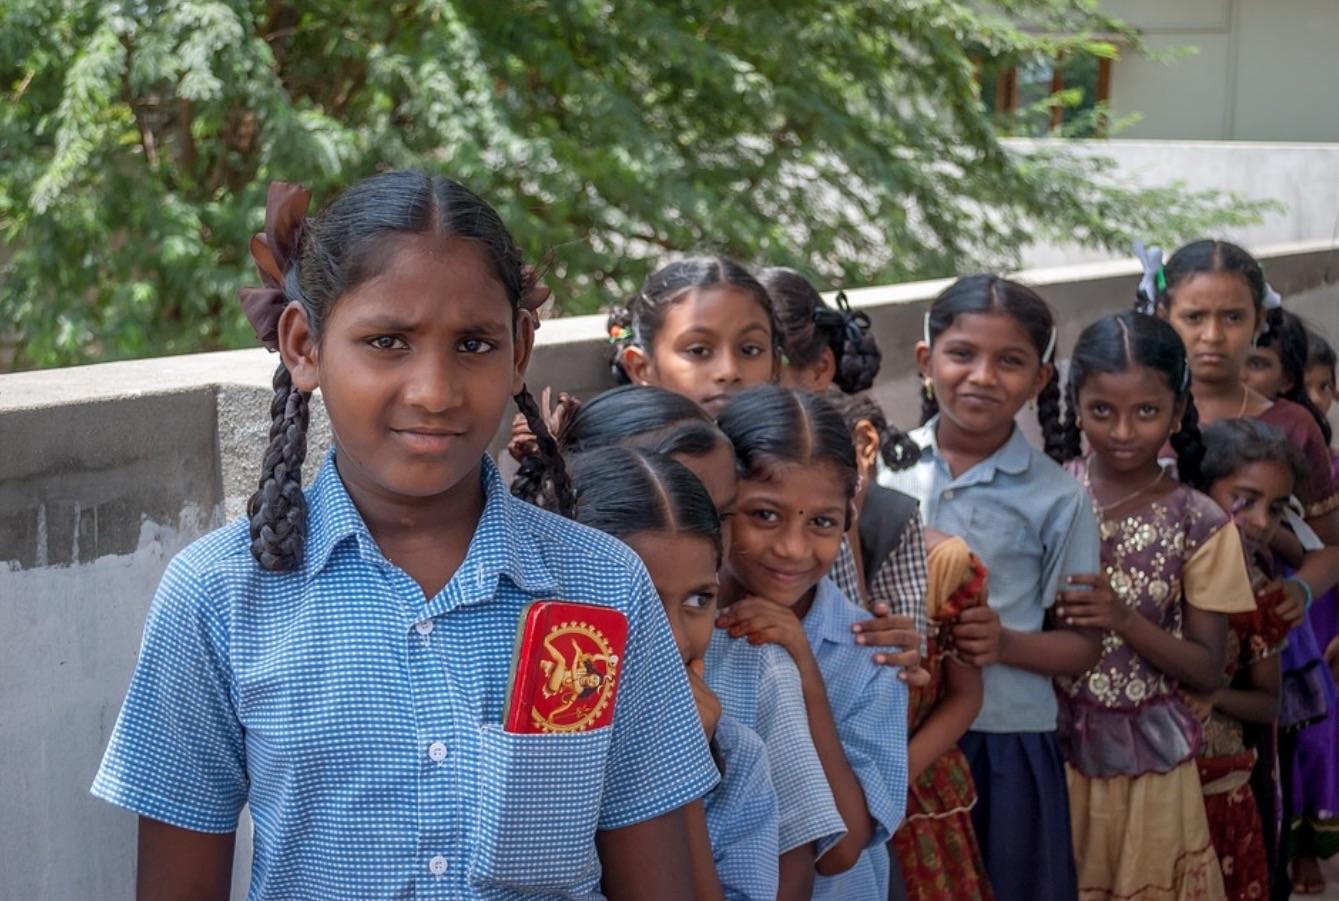 Meninas em orfanato na Índia.